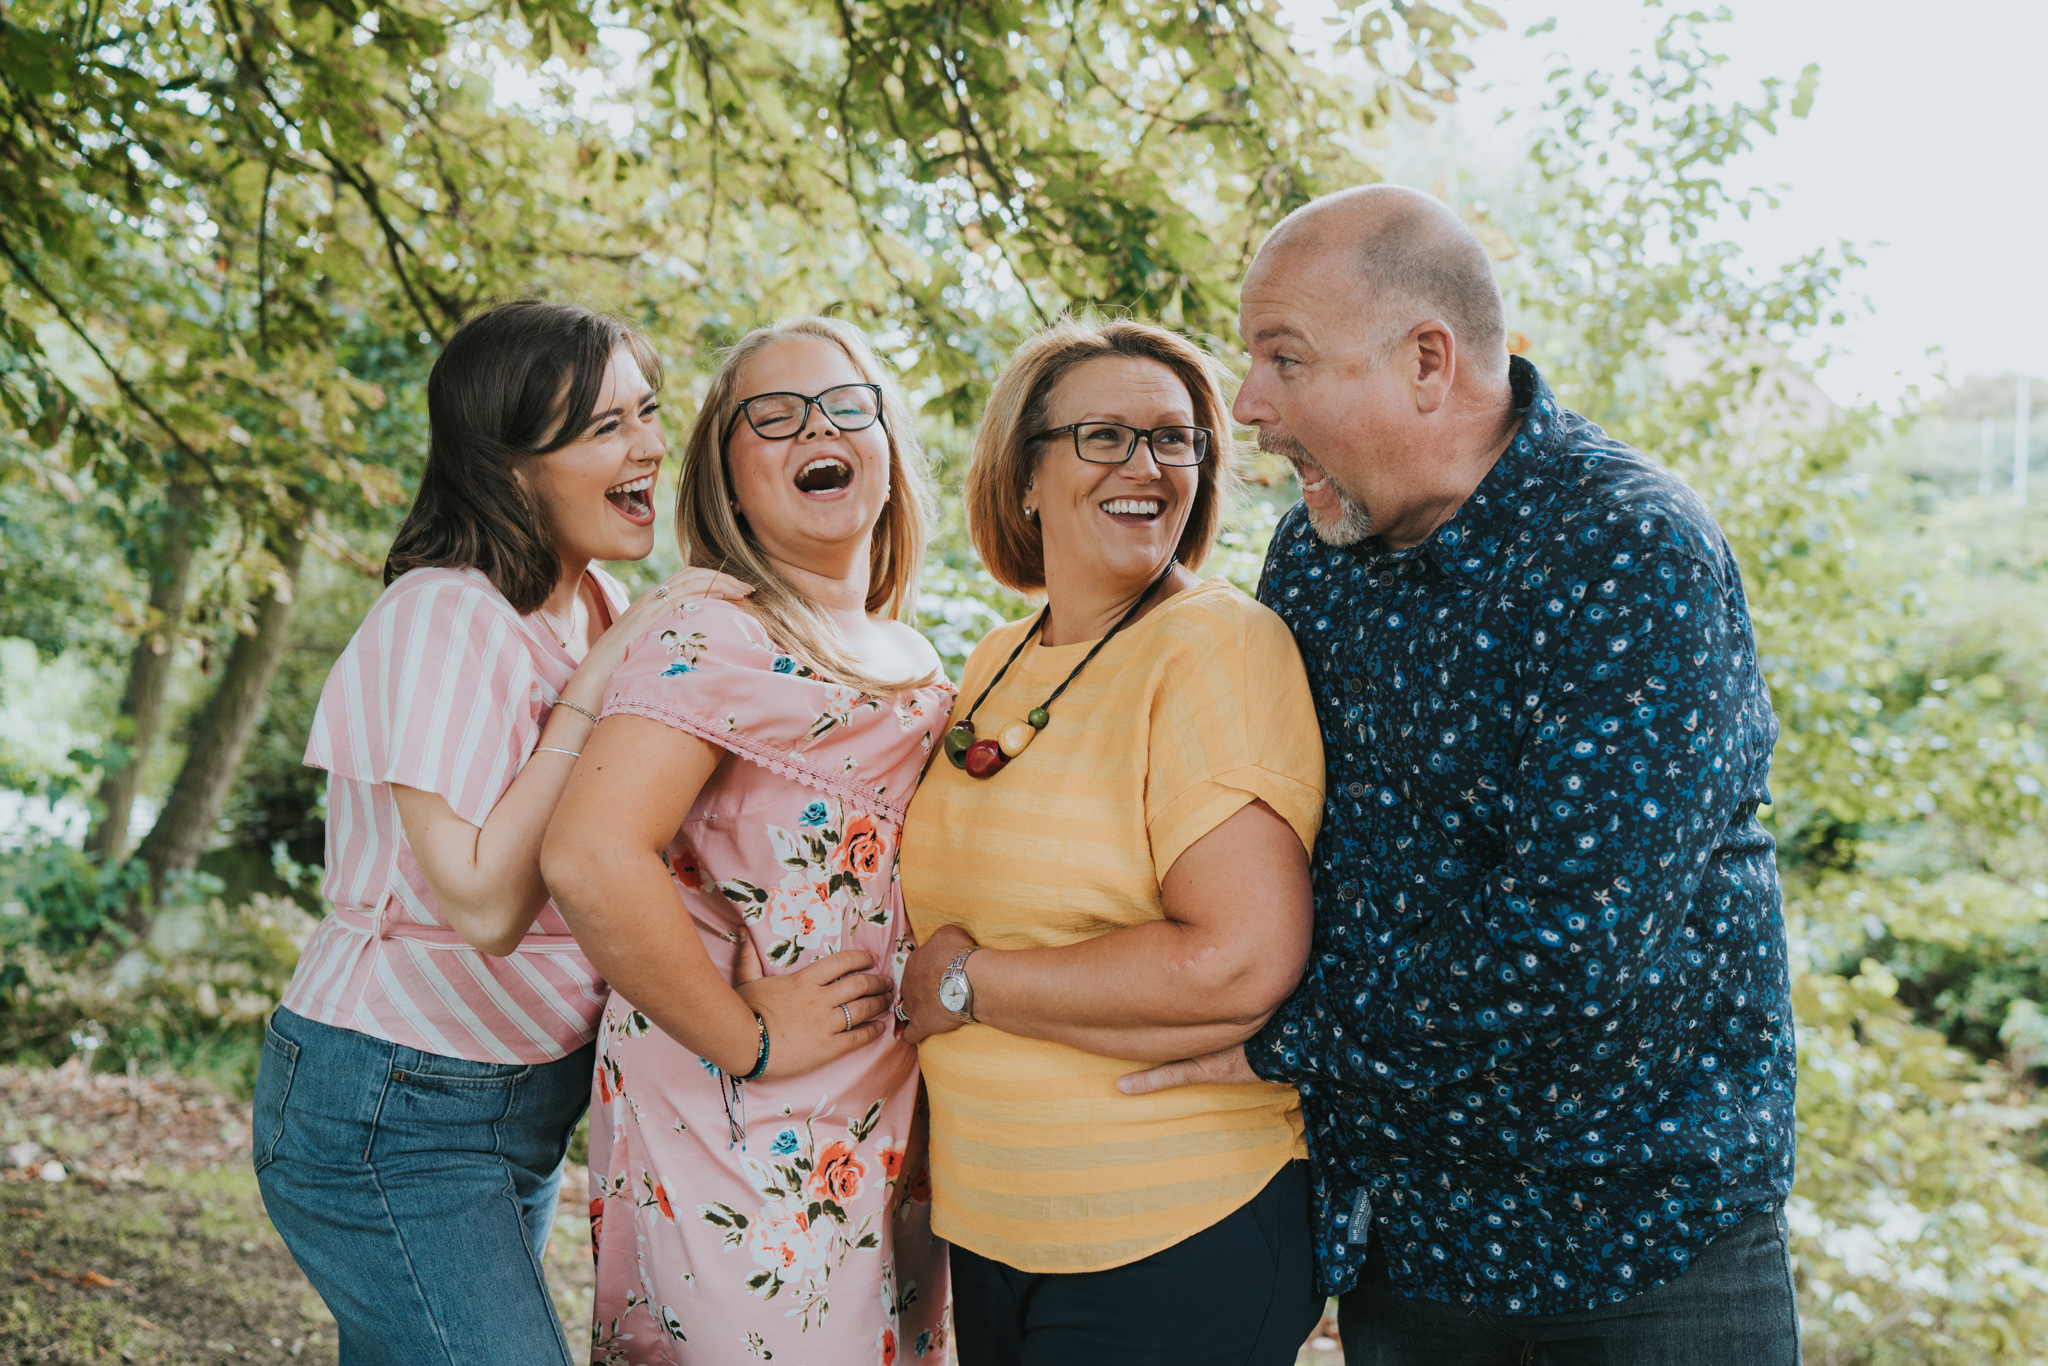 Fitch-Family-Colchester-Castle-Park-Grace-Elizabeth-Alternative-Wedding-Lifestyle-Photographer-Colchester-Essex-Suffolk-Norfolk-Devon (16 of 41).jpg